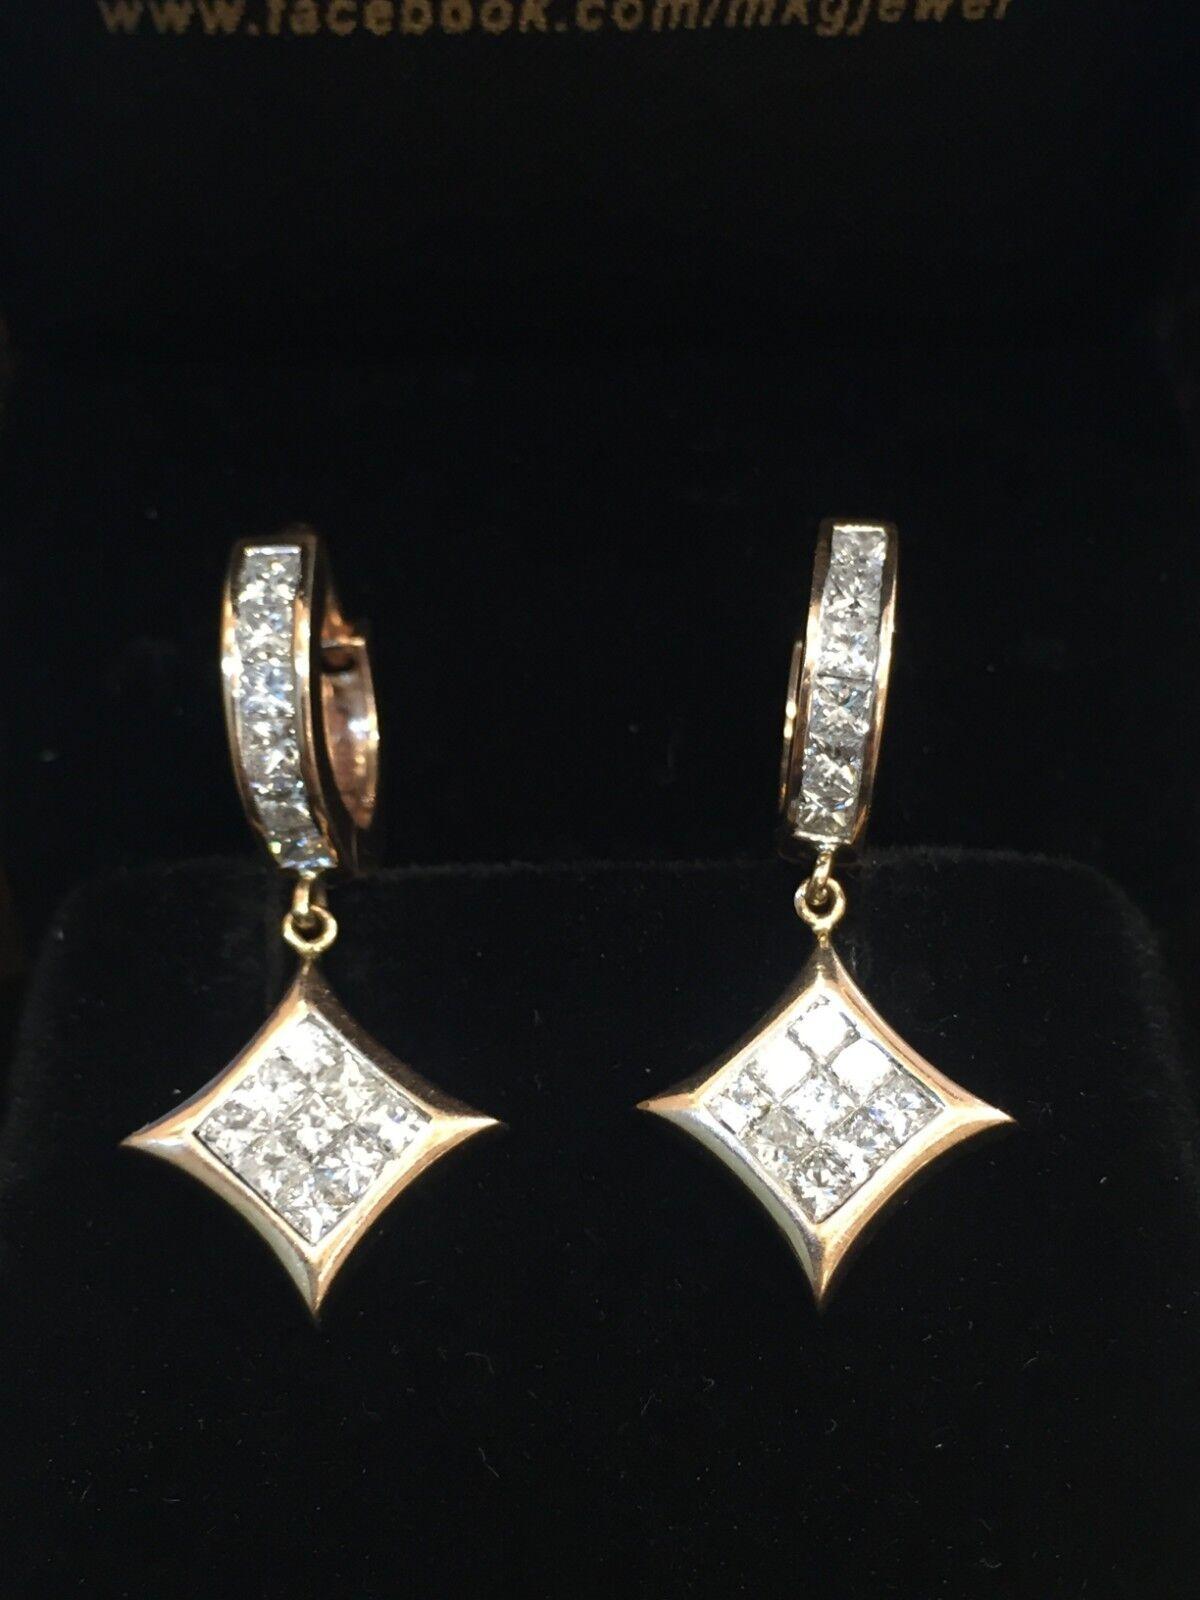 1.96 Cts Princess Cut Natural Diamonds Dangle Earrings In Fine Hallmark 14K gold